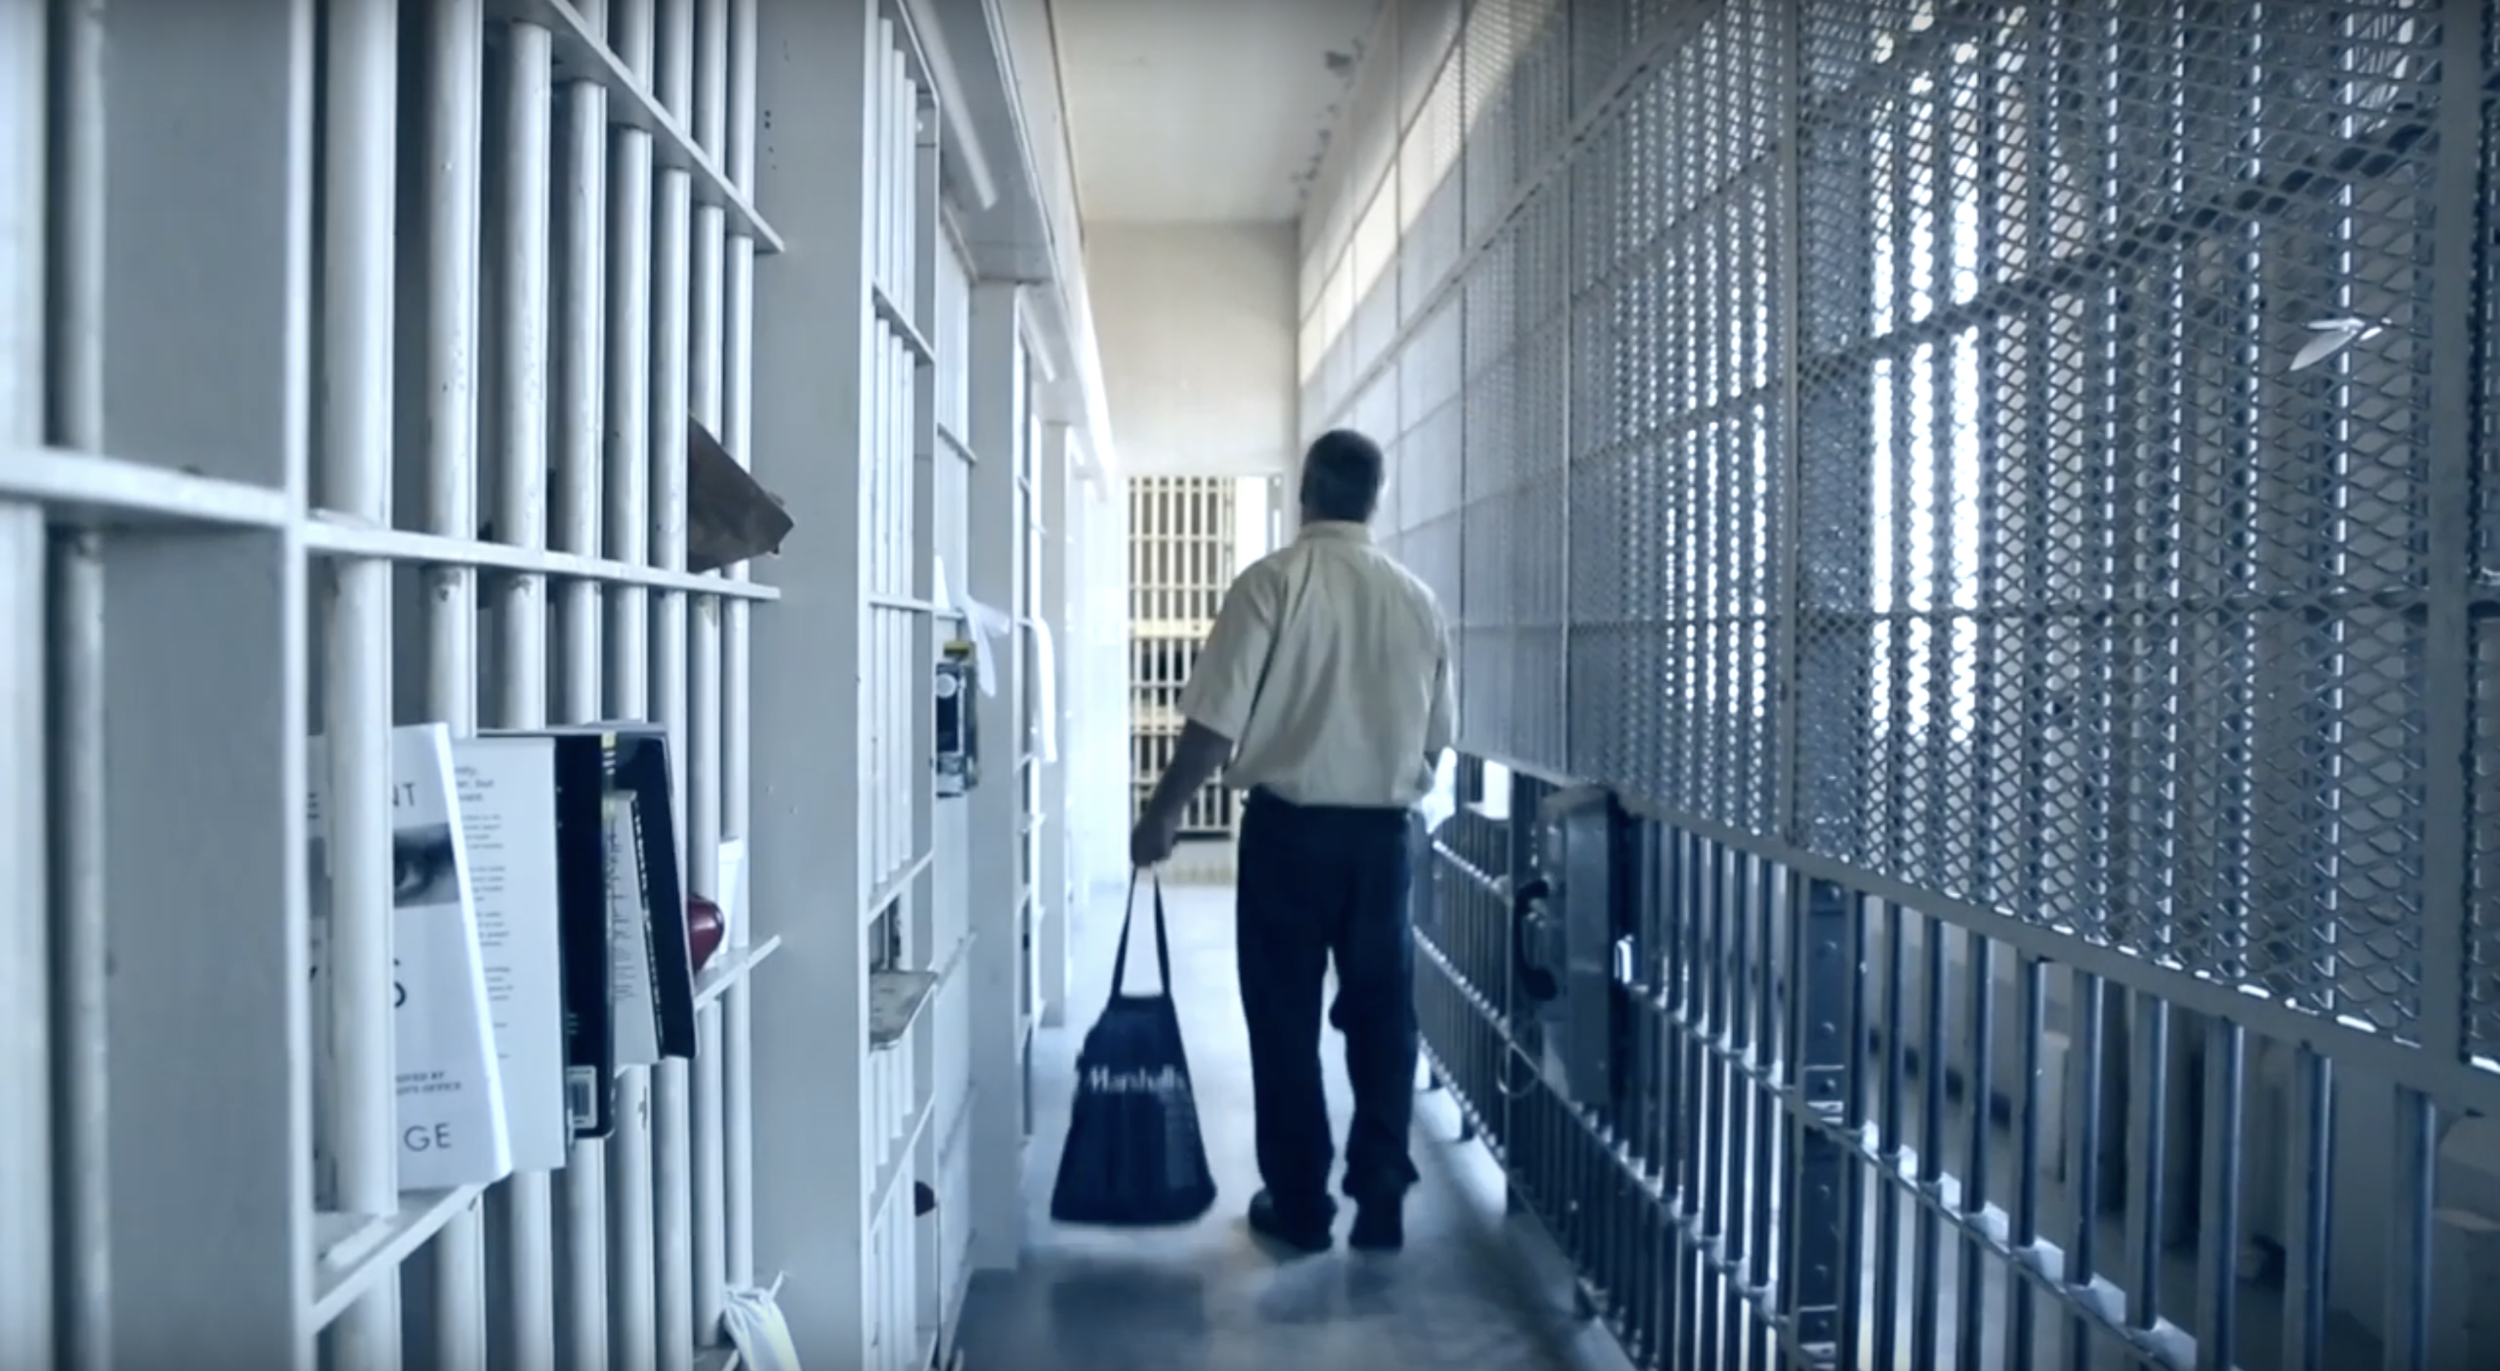 Gateway To Glory - Jail Ministry 2